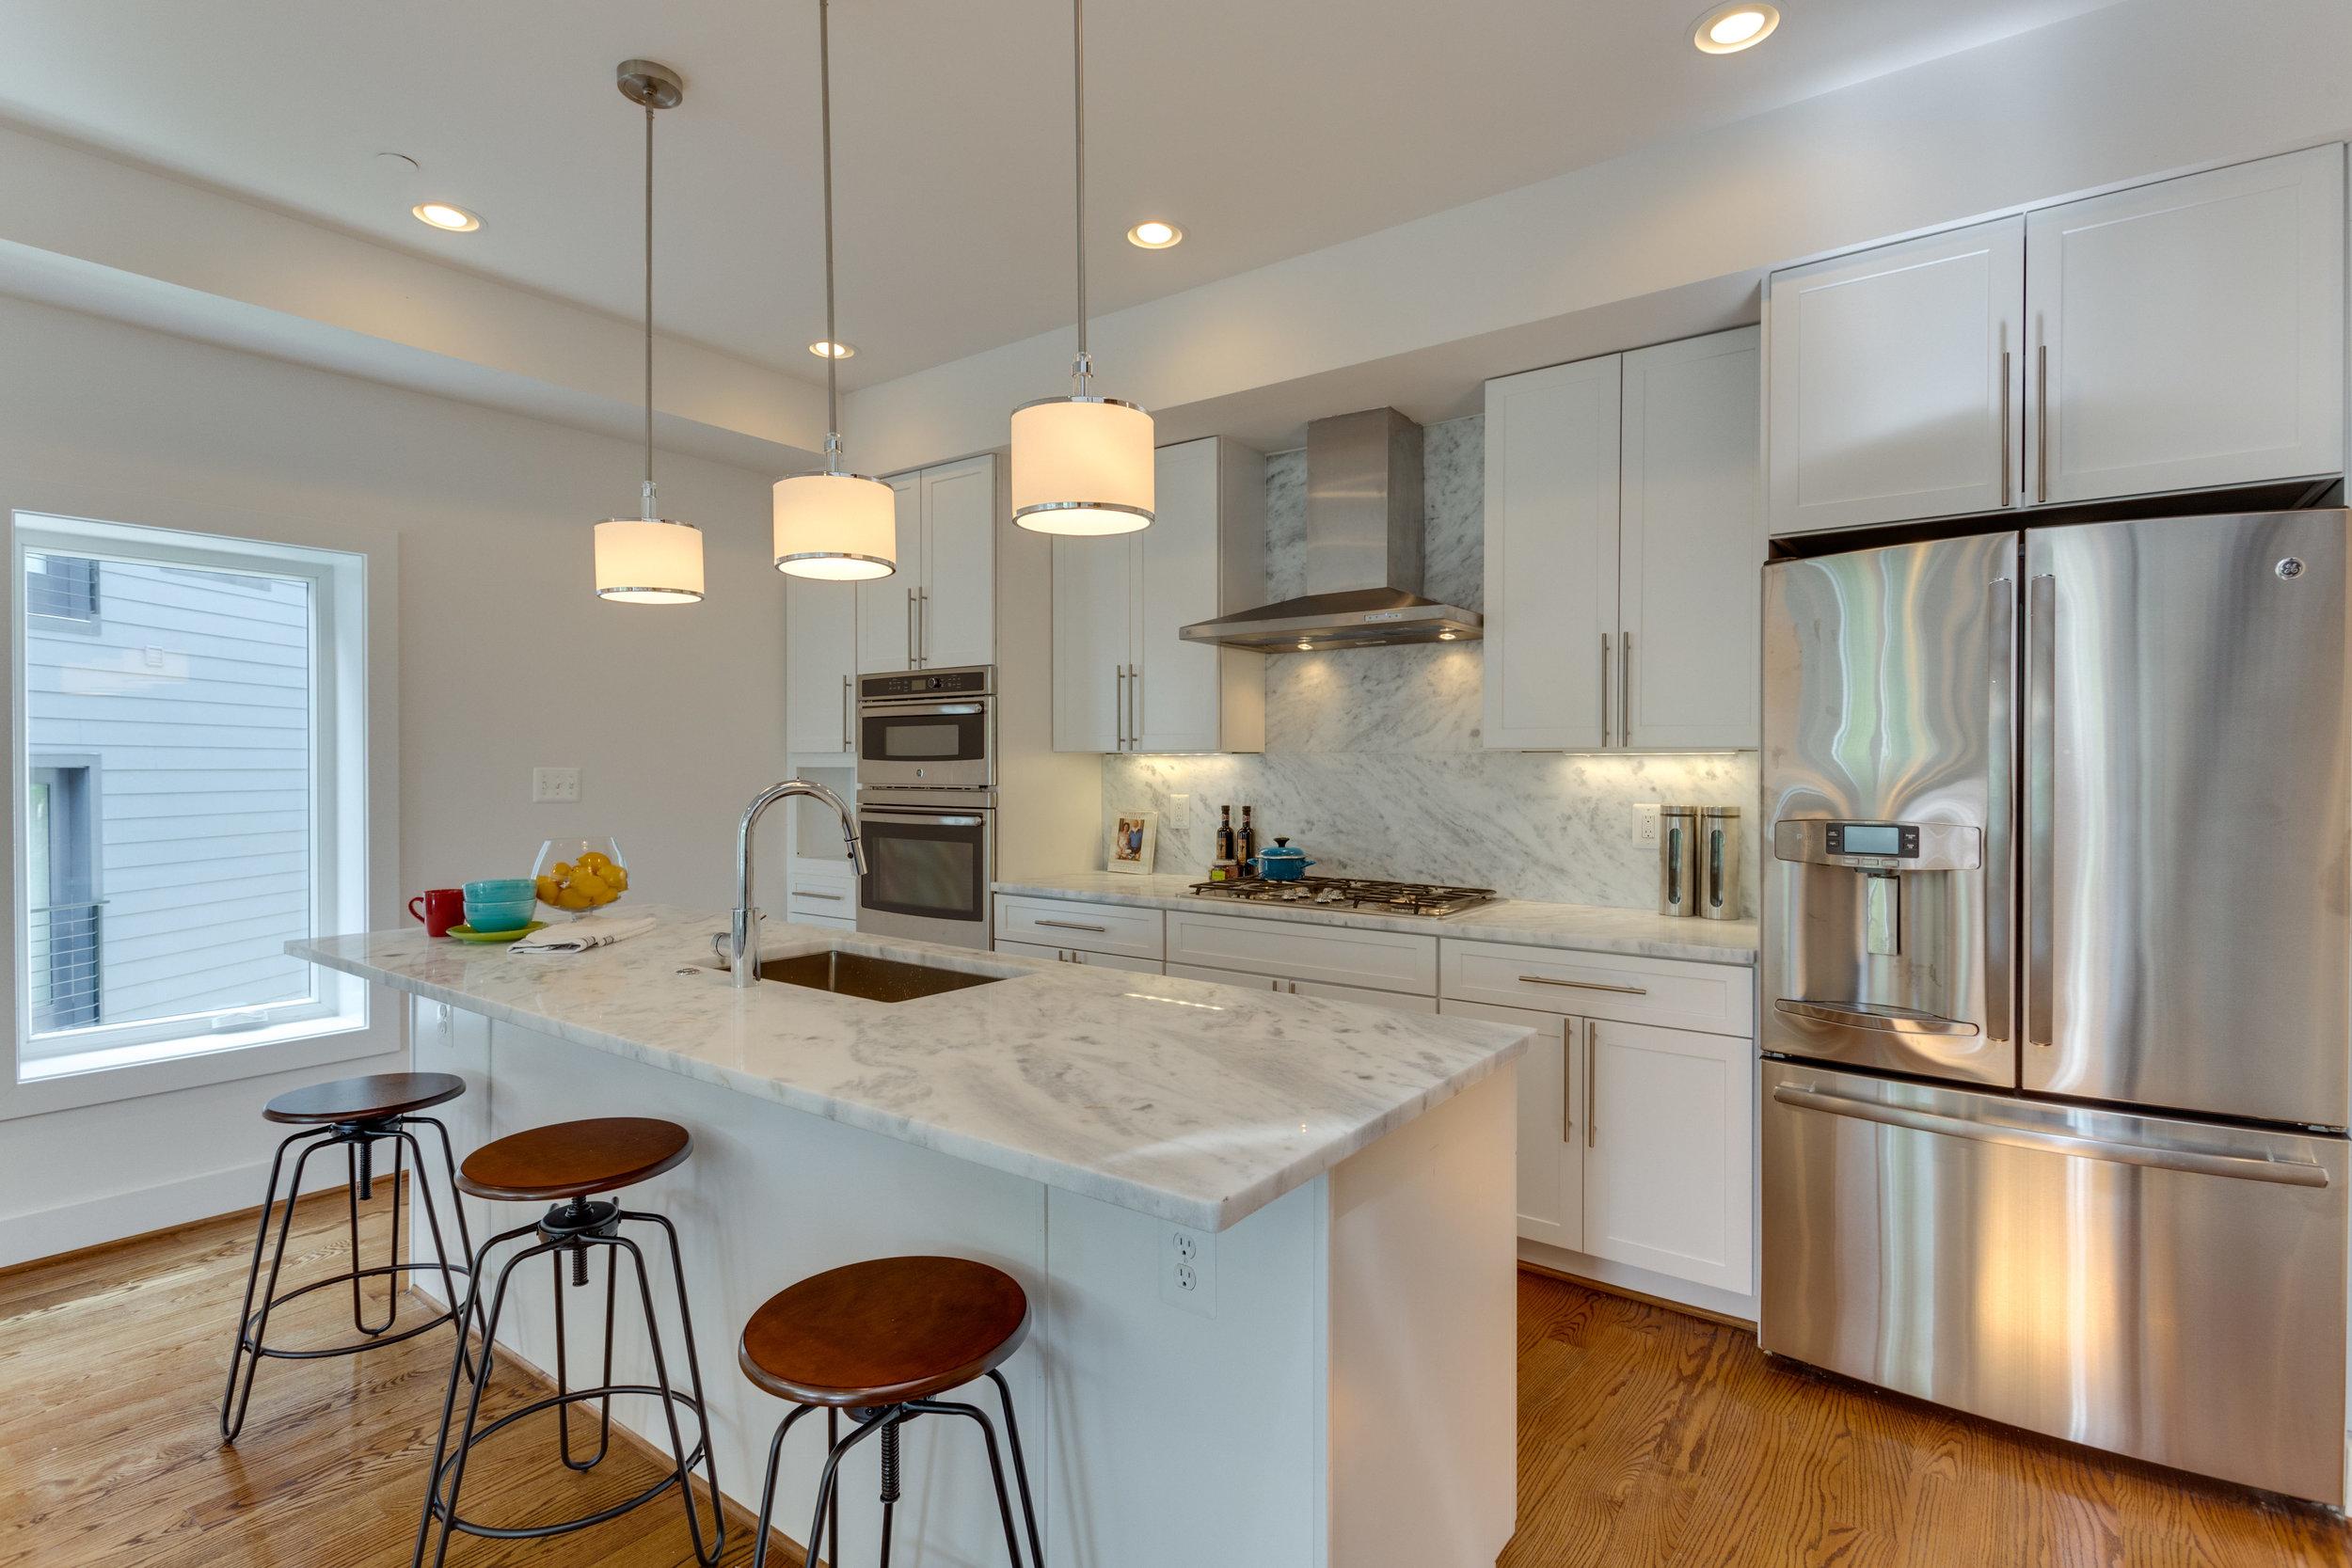 15 Grant Cir NW Unit 3-print-004-32-KitchenFamily Room-4200x2800-300dpi.jpg